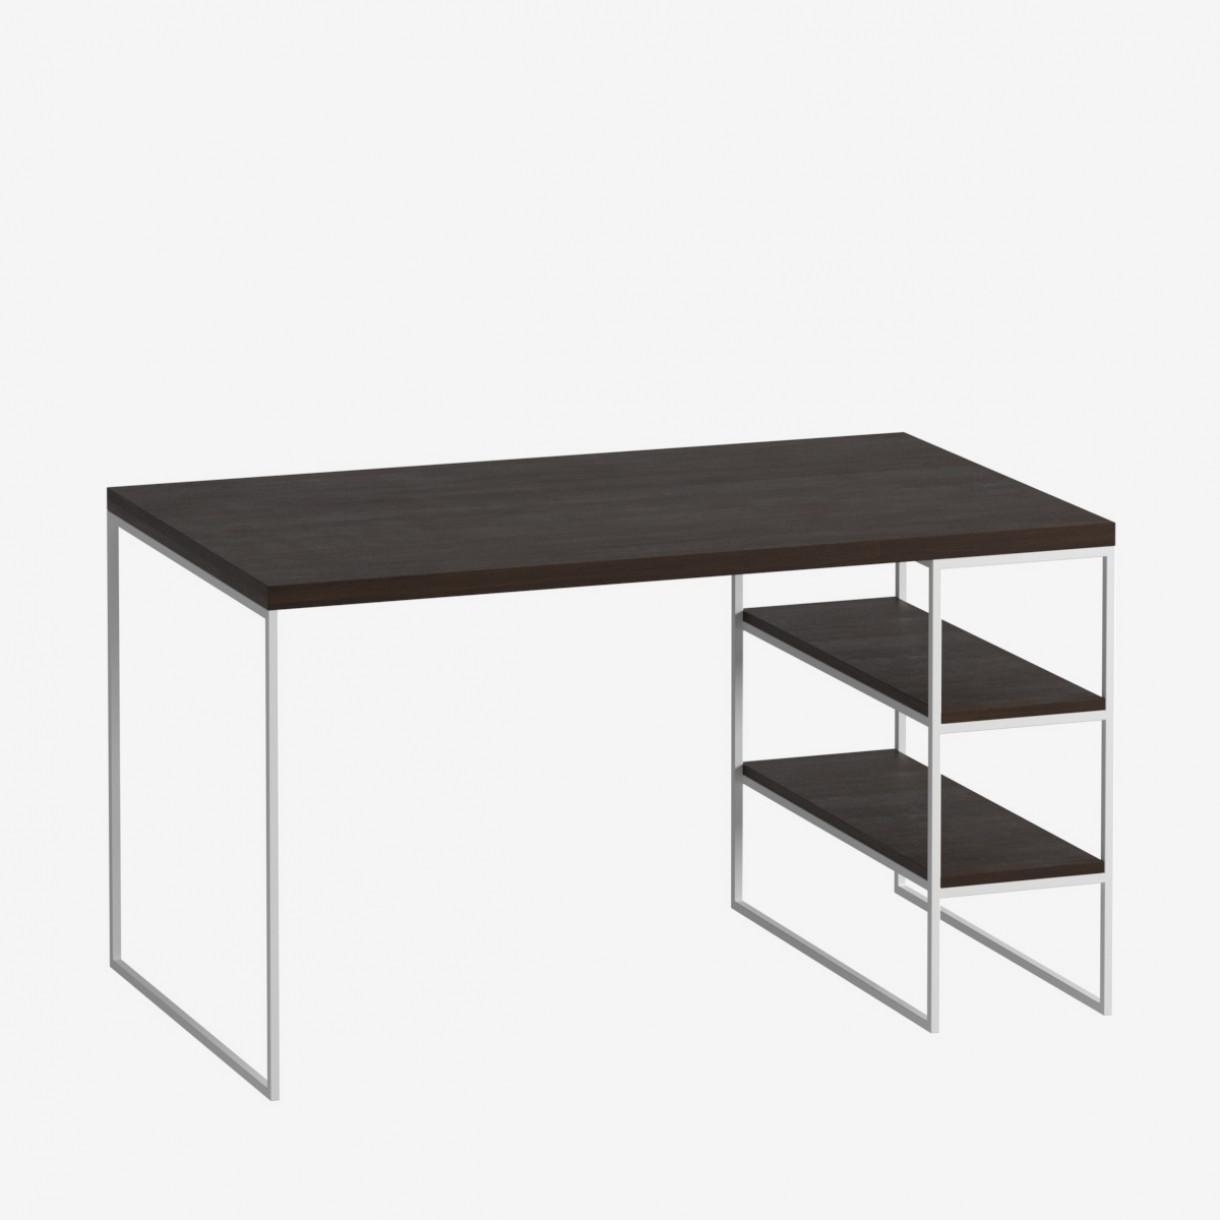 Письменный стол GoodsMetall с полочками 1200х600х750 ПС71